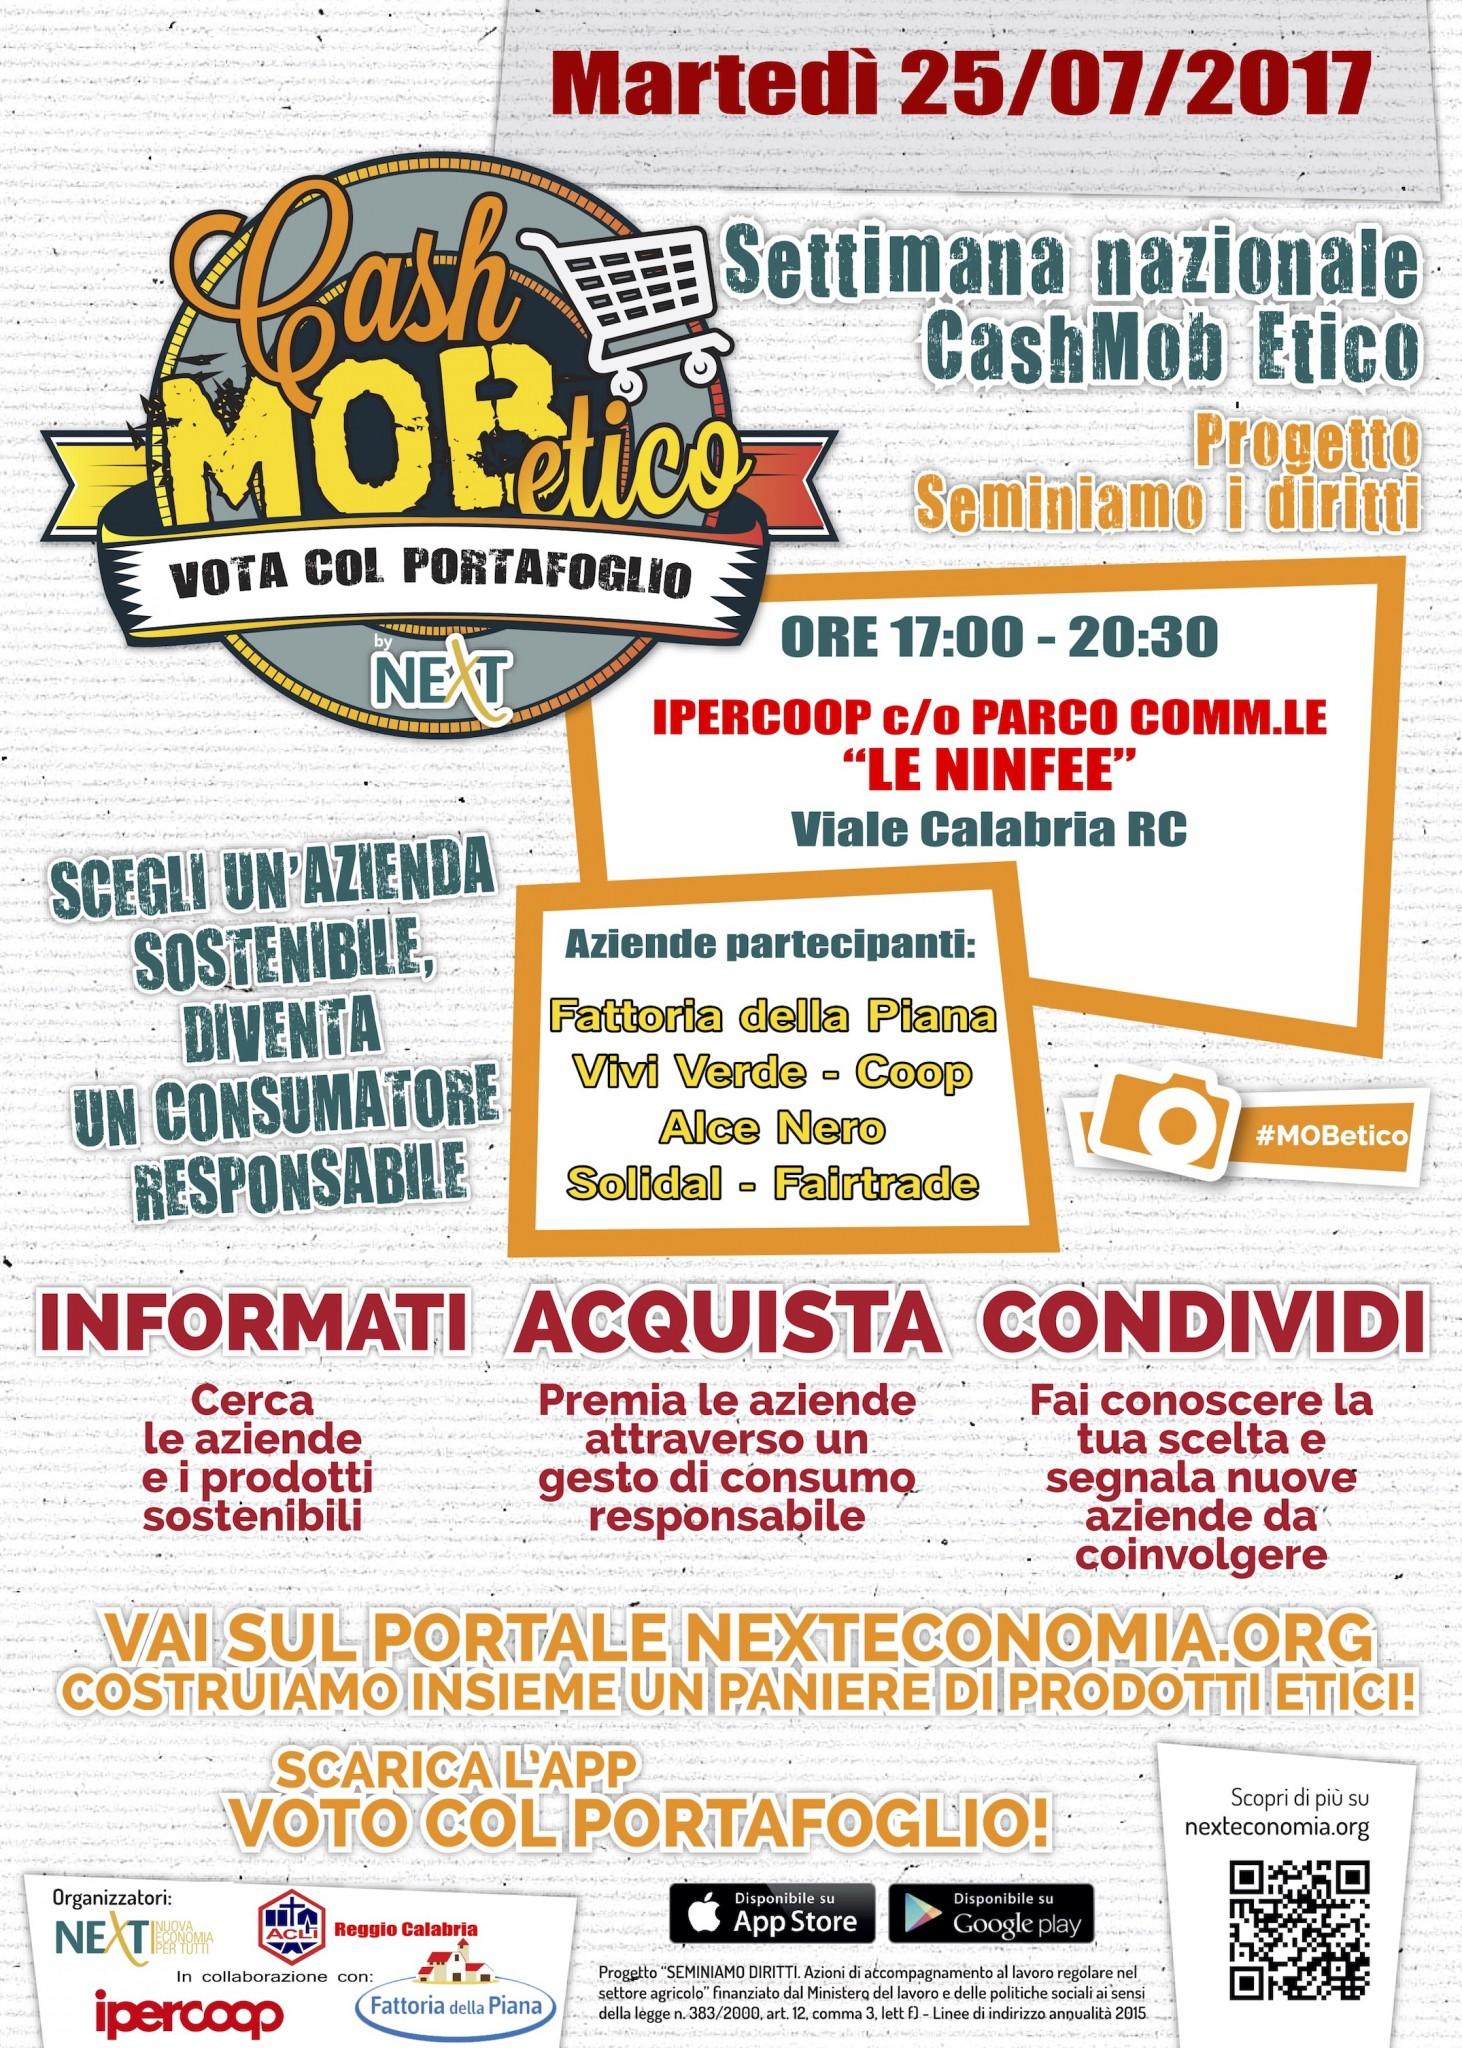 Locandina Cash Mob Etico agg 4